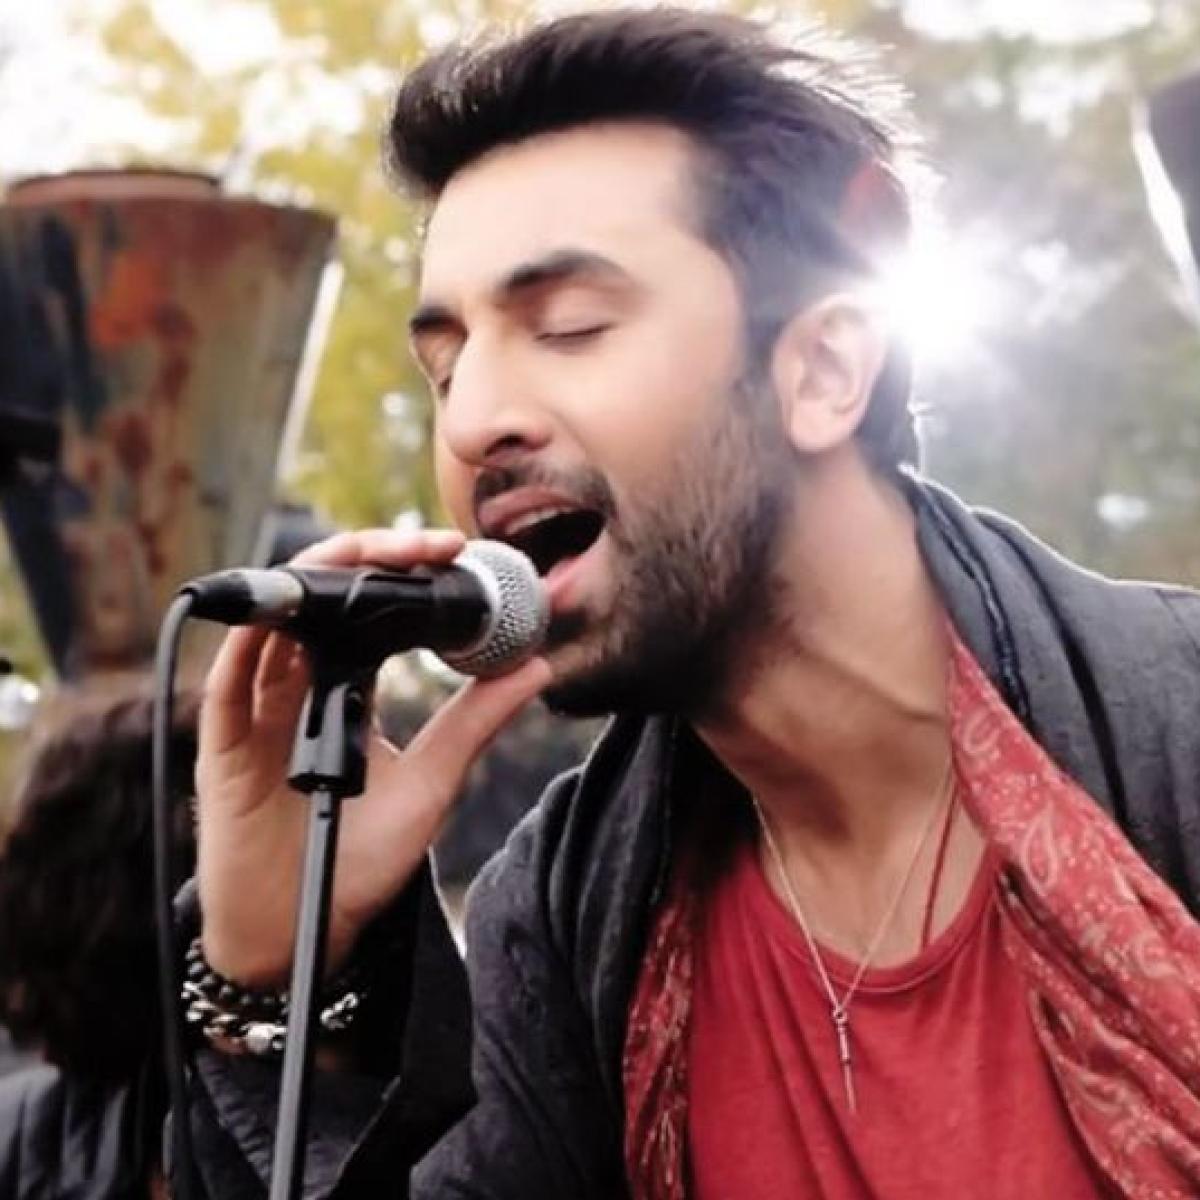 Watch: When Ranbir Kapoor's singing teacher called him tone-deaf and said, 'unse naa ho payega'